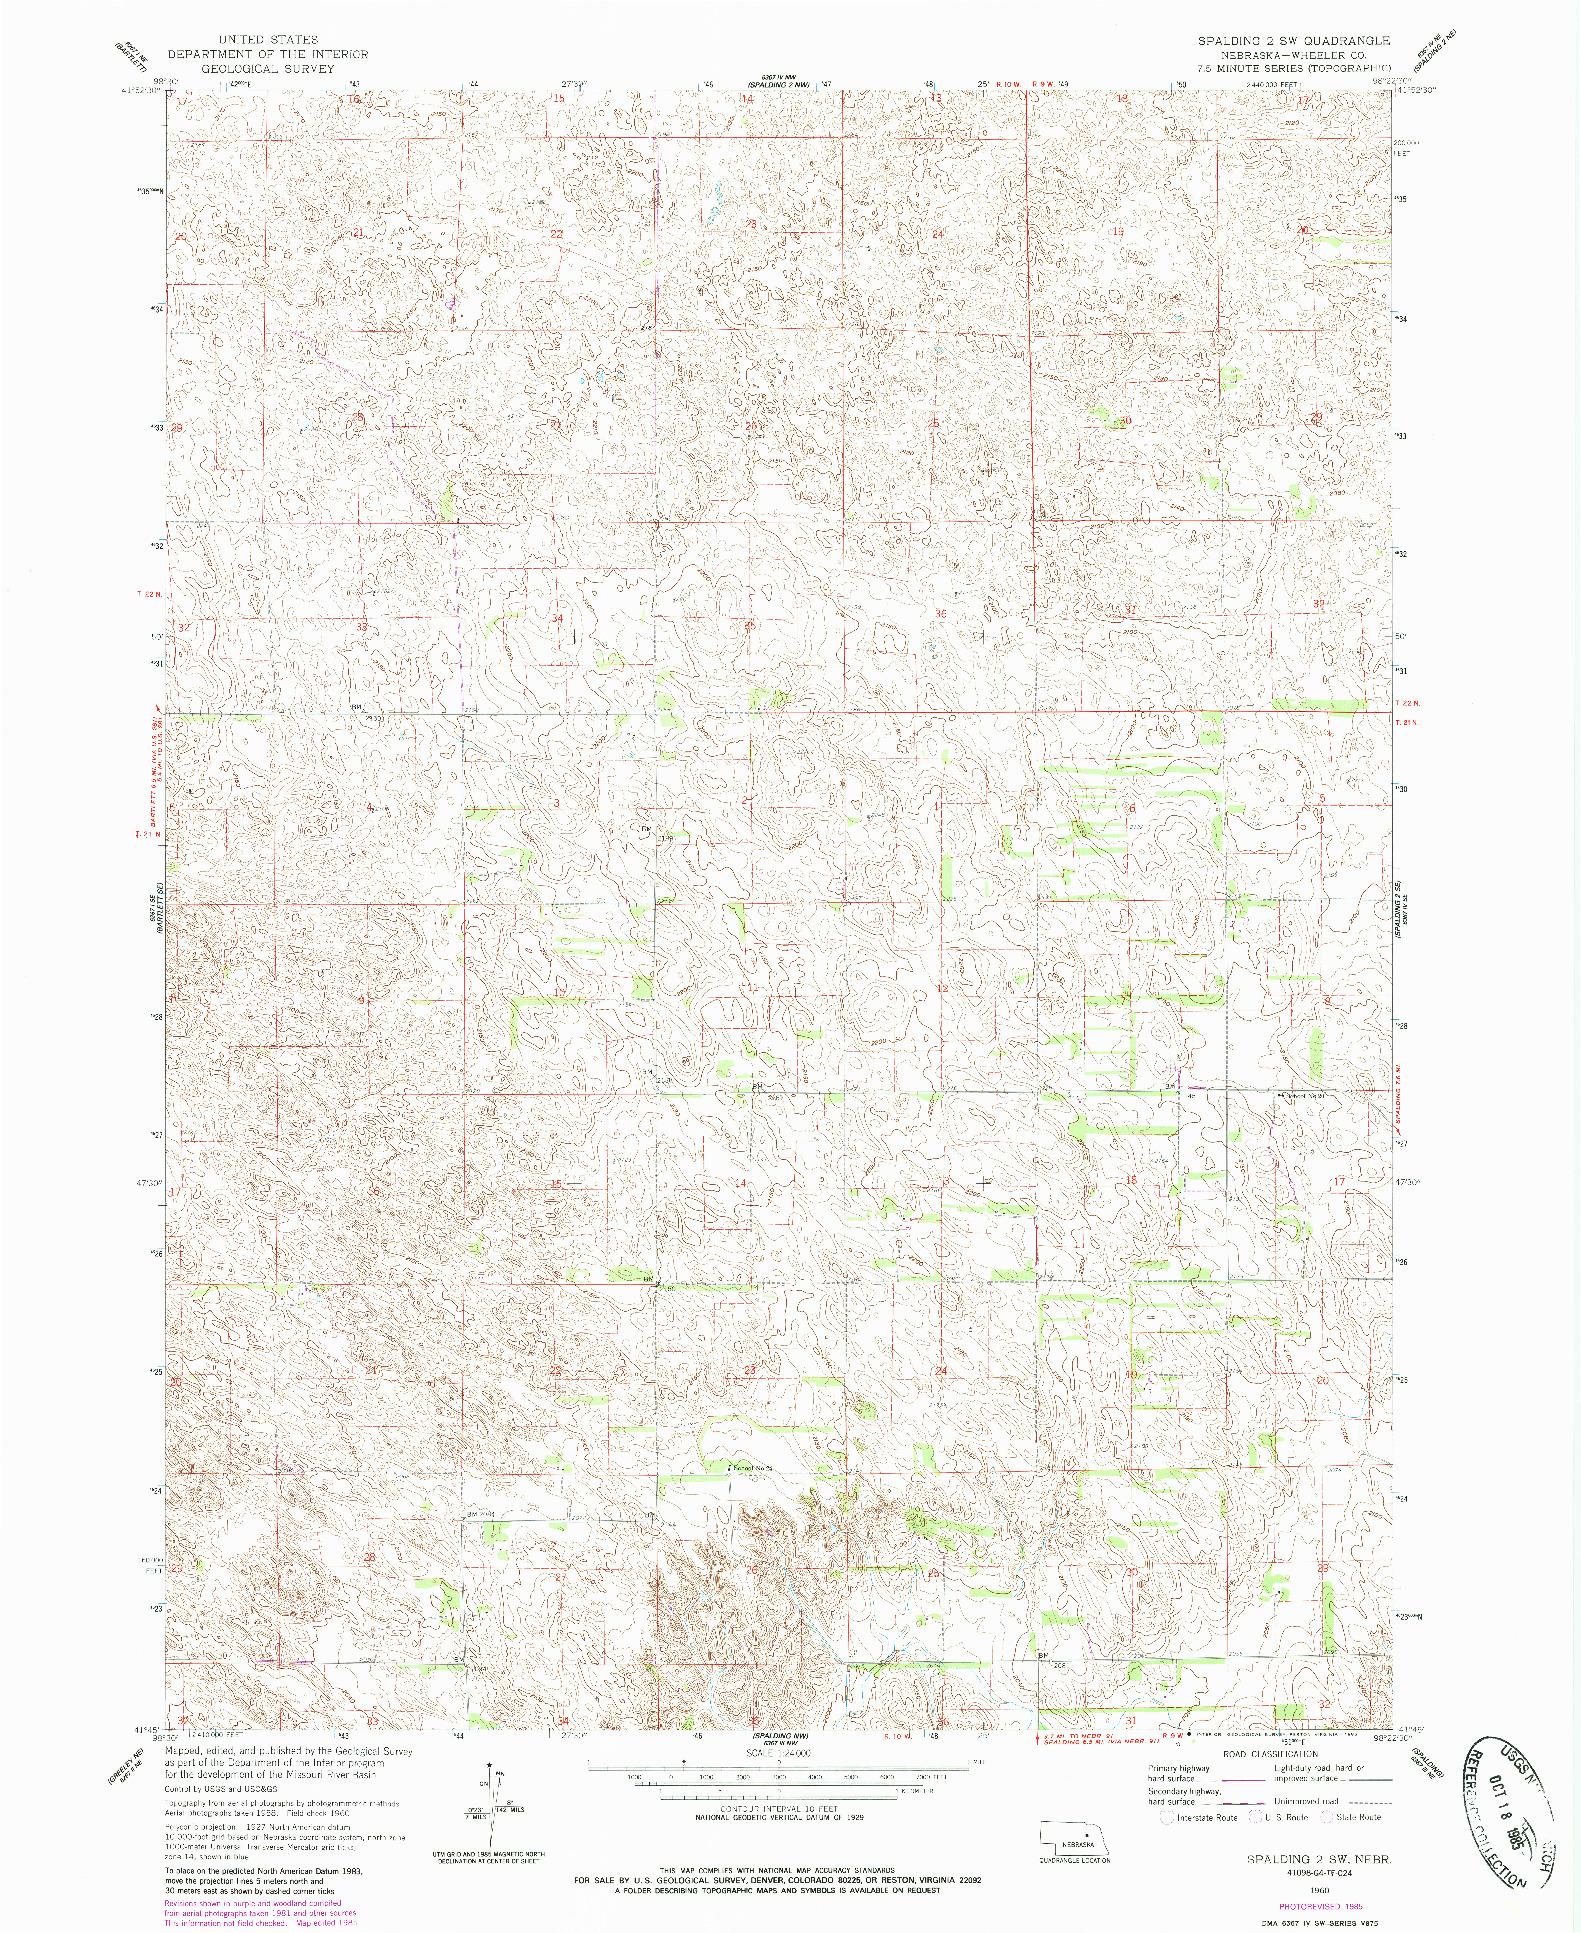 USGS 1:24000-SCALE QUADRANGLE FOR SPALDING 2 SW, NE 1960